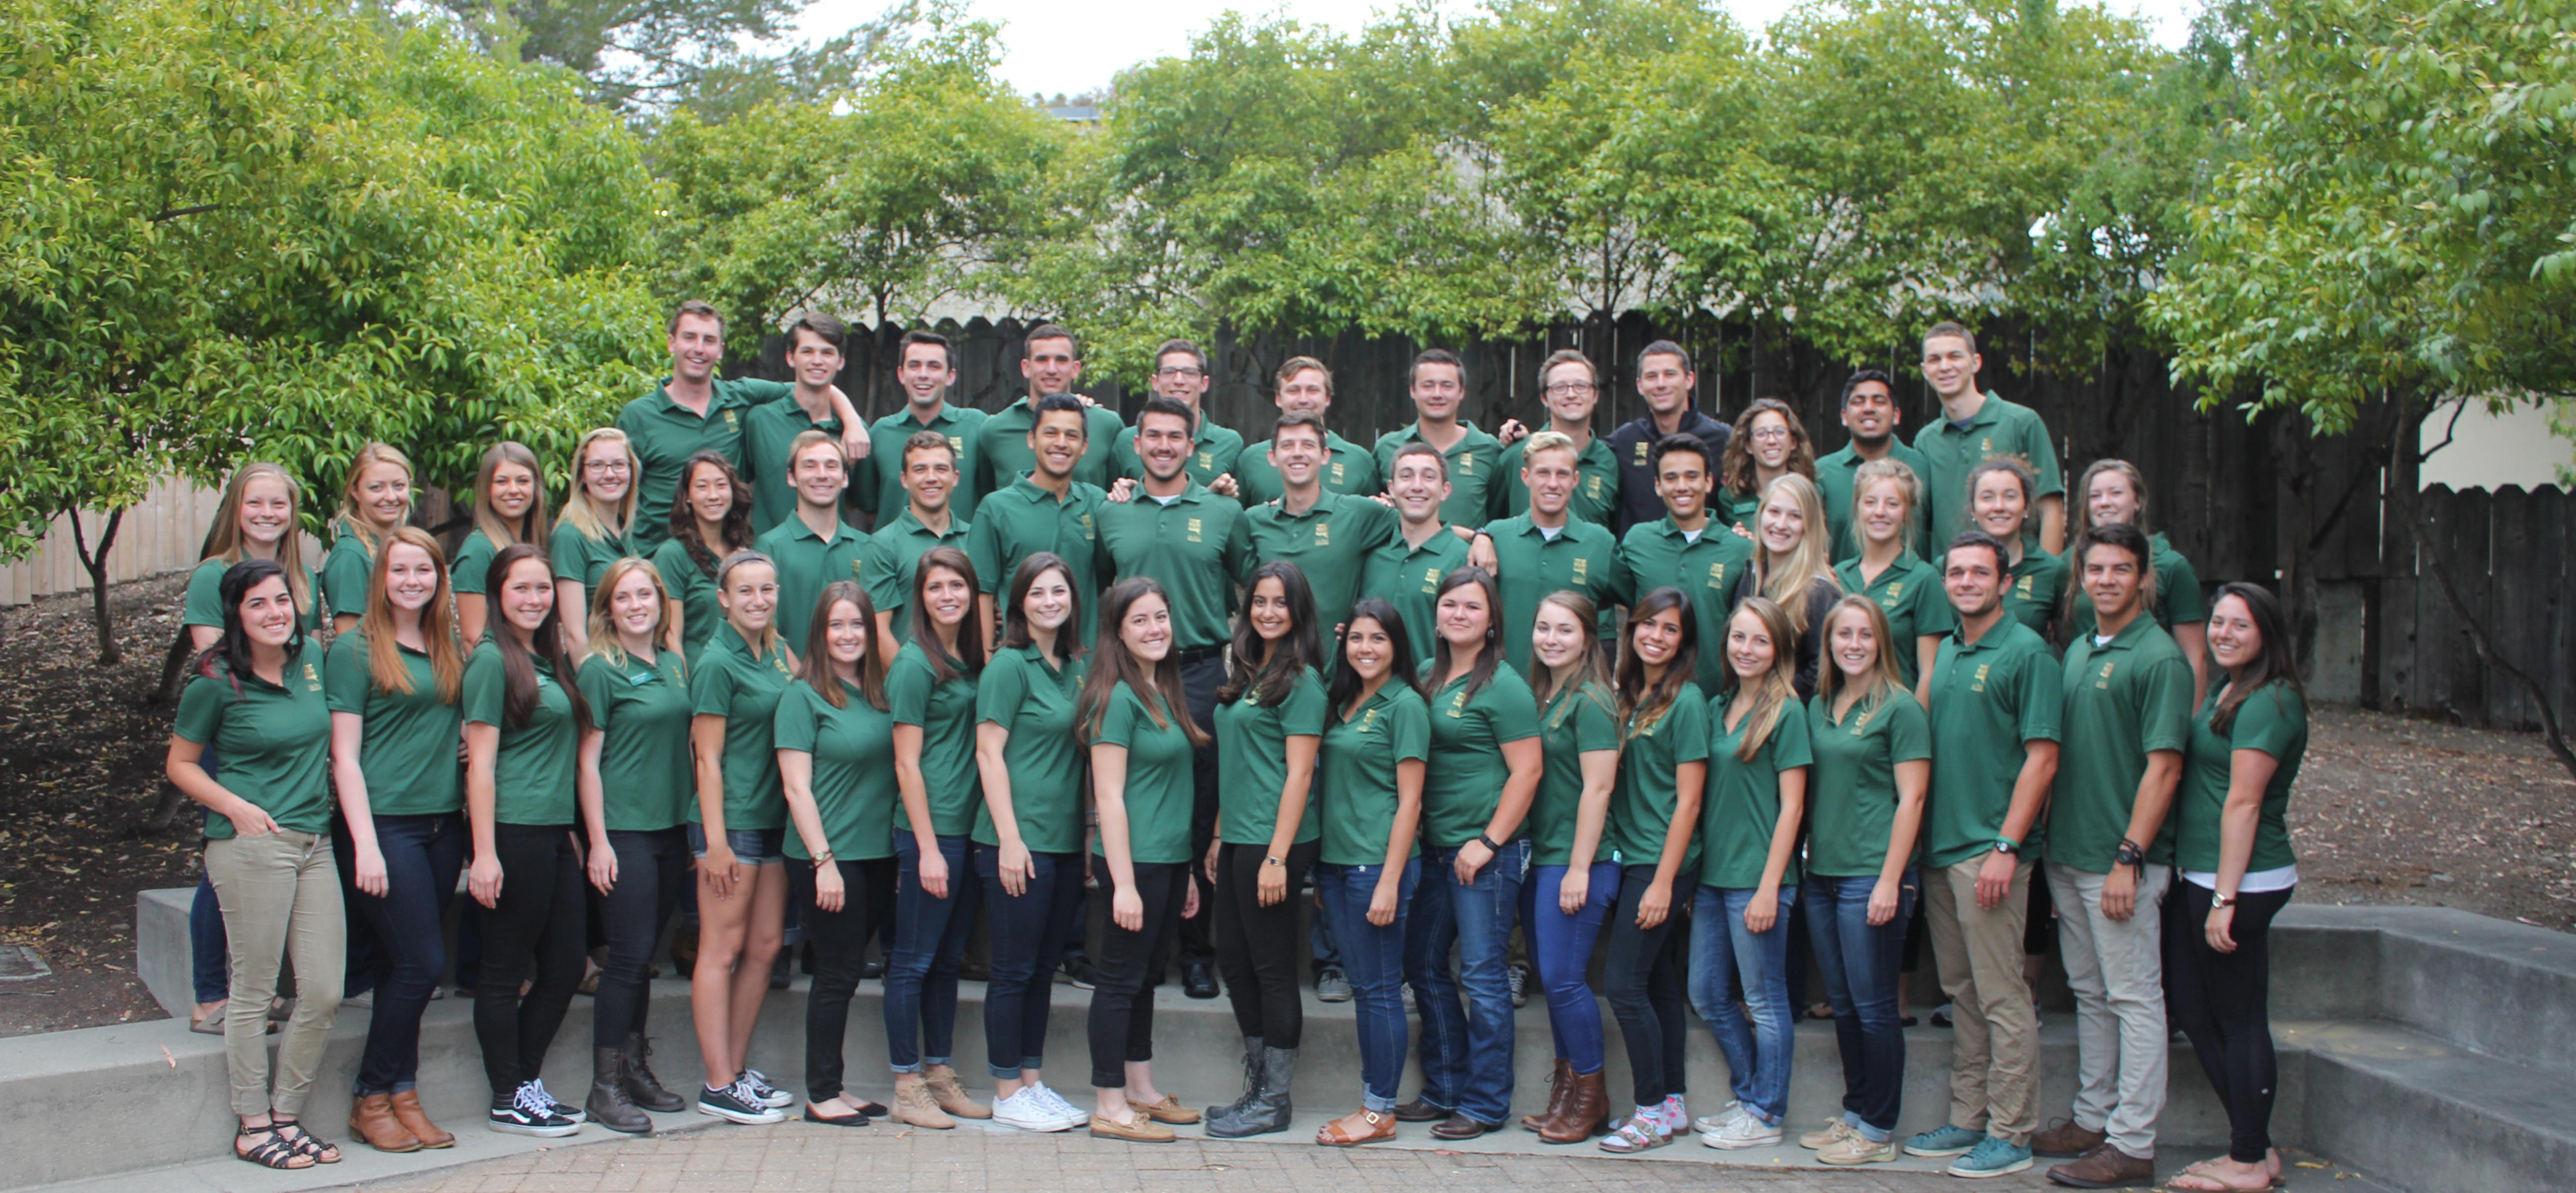 svp student group